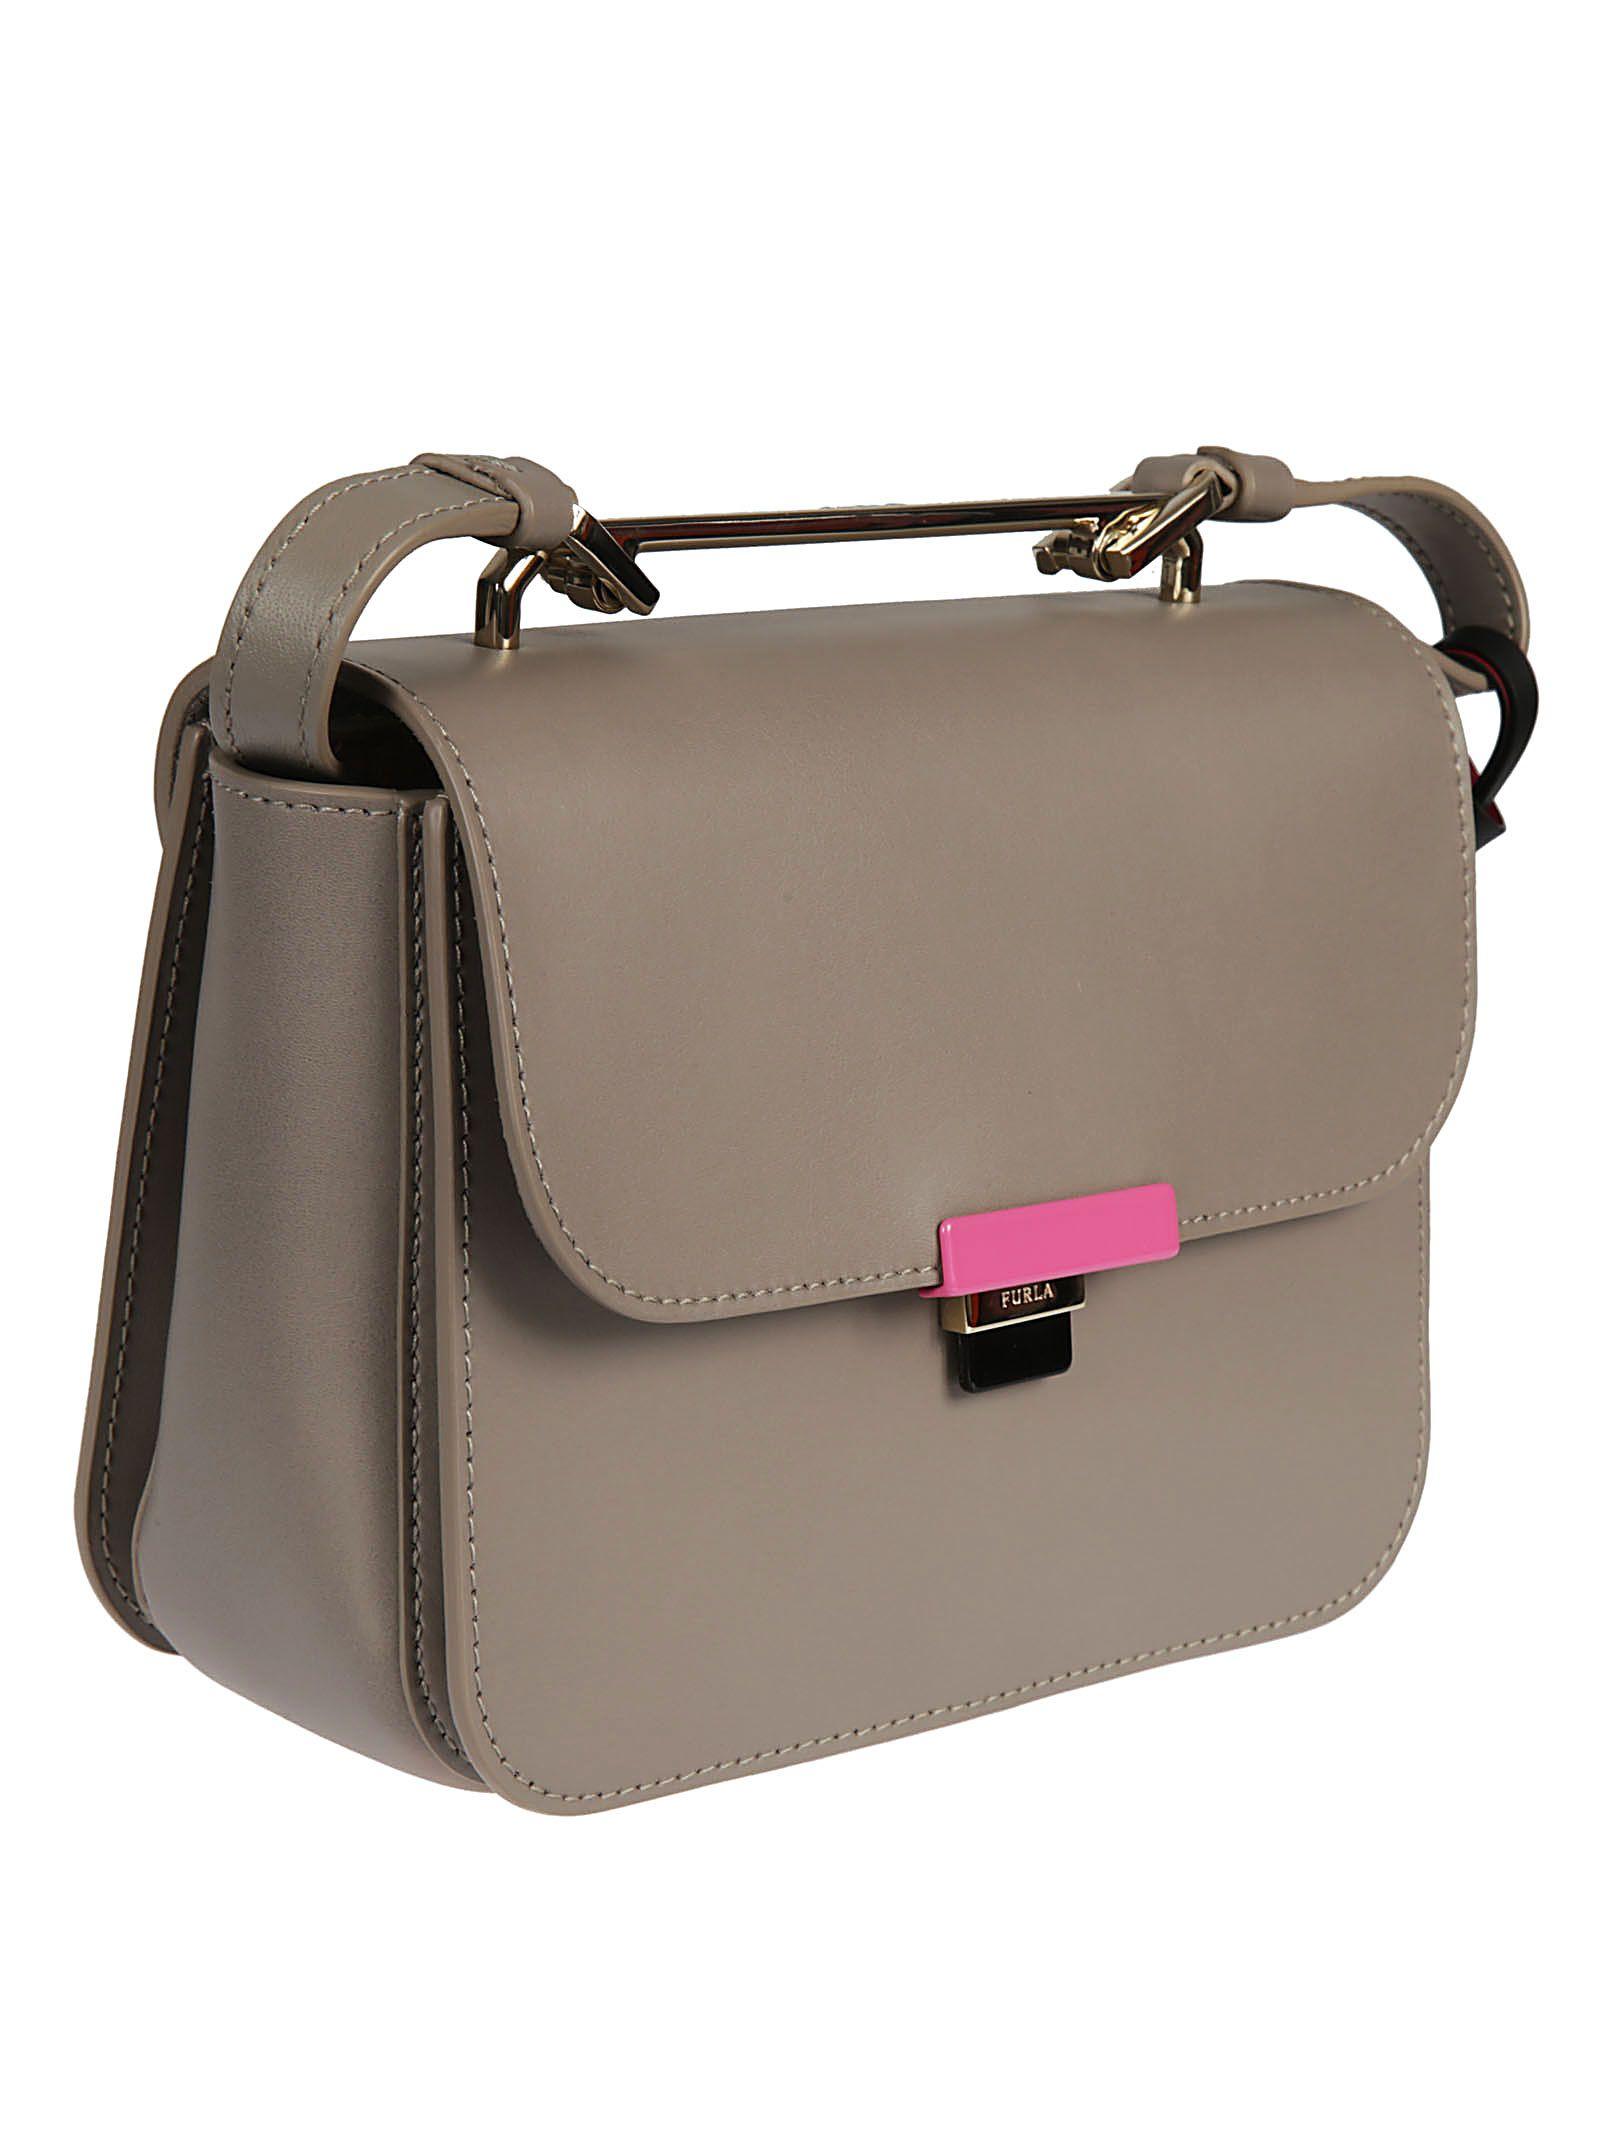 Shoulder Bag for Women, Sand, Leather, 2017, one size Furla